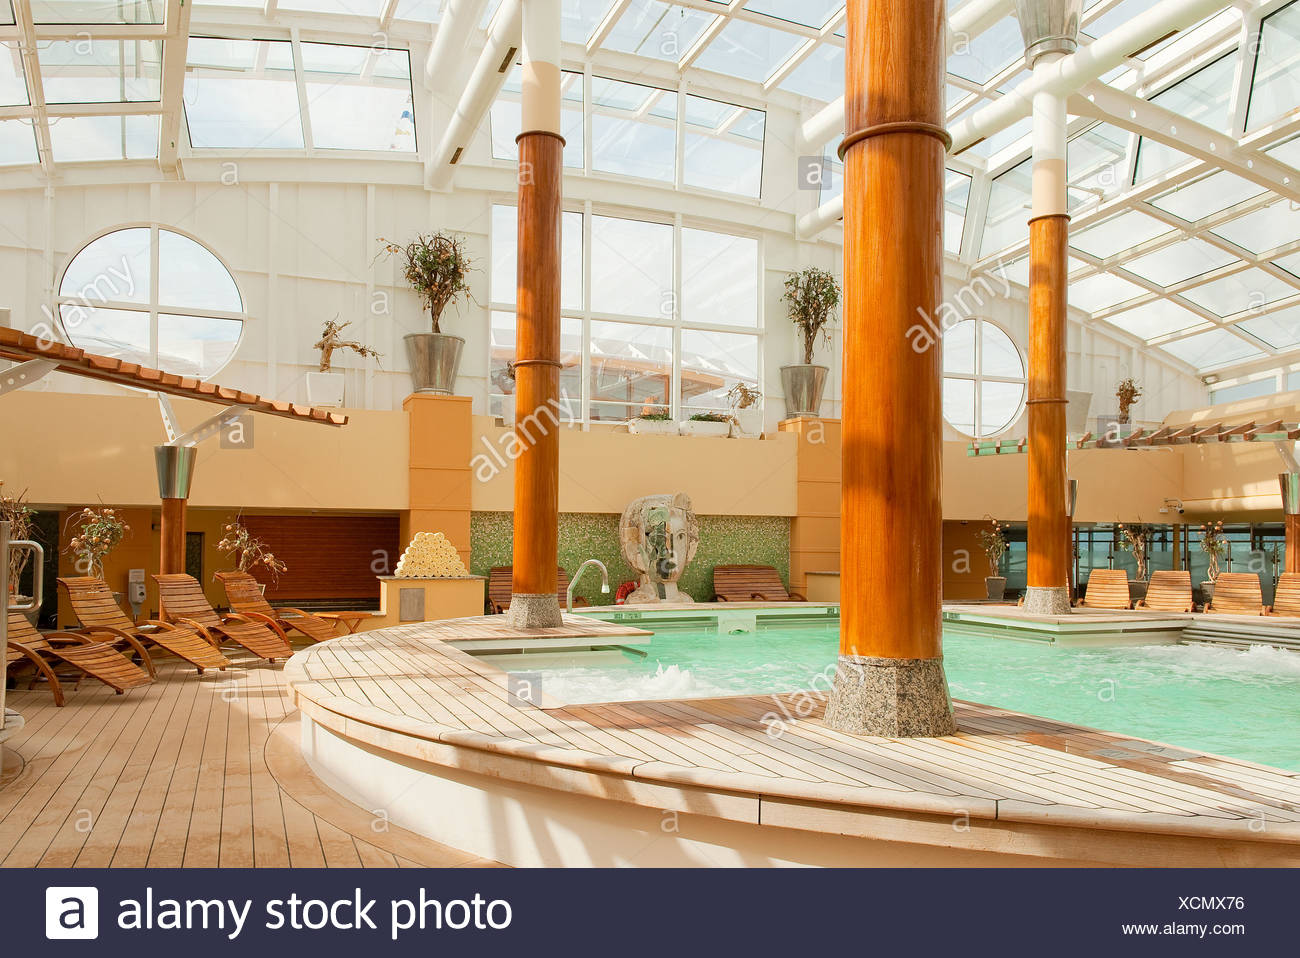 Aqua therapy pool on a cruise ship. - Stock Image